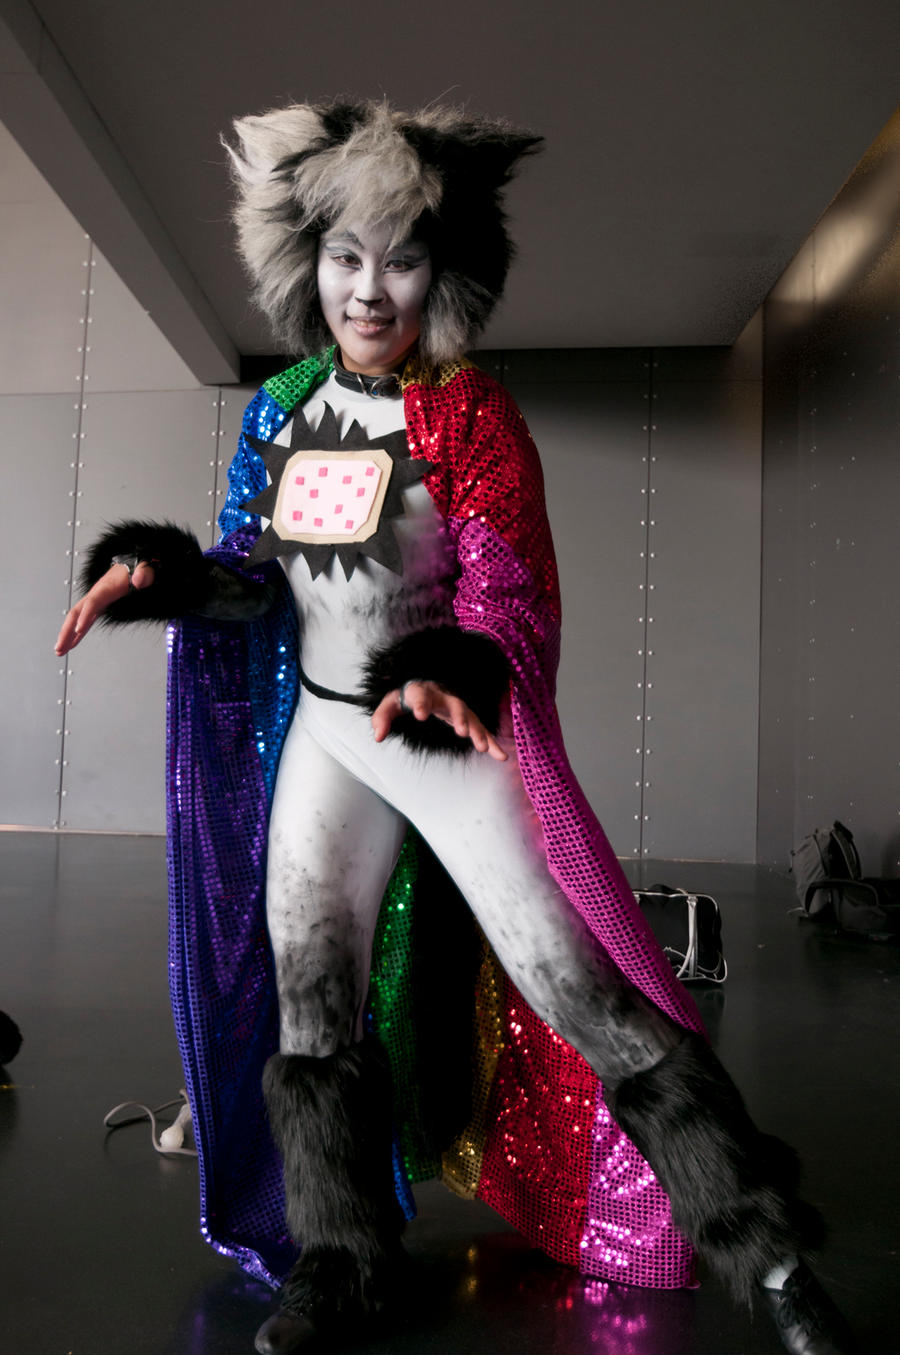 Nyan cat costume jenna marbles